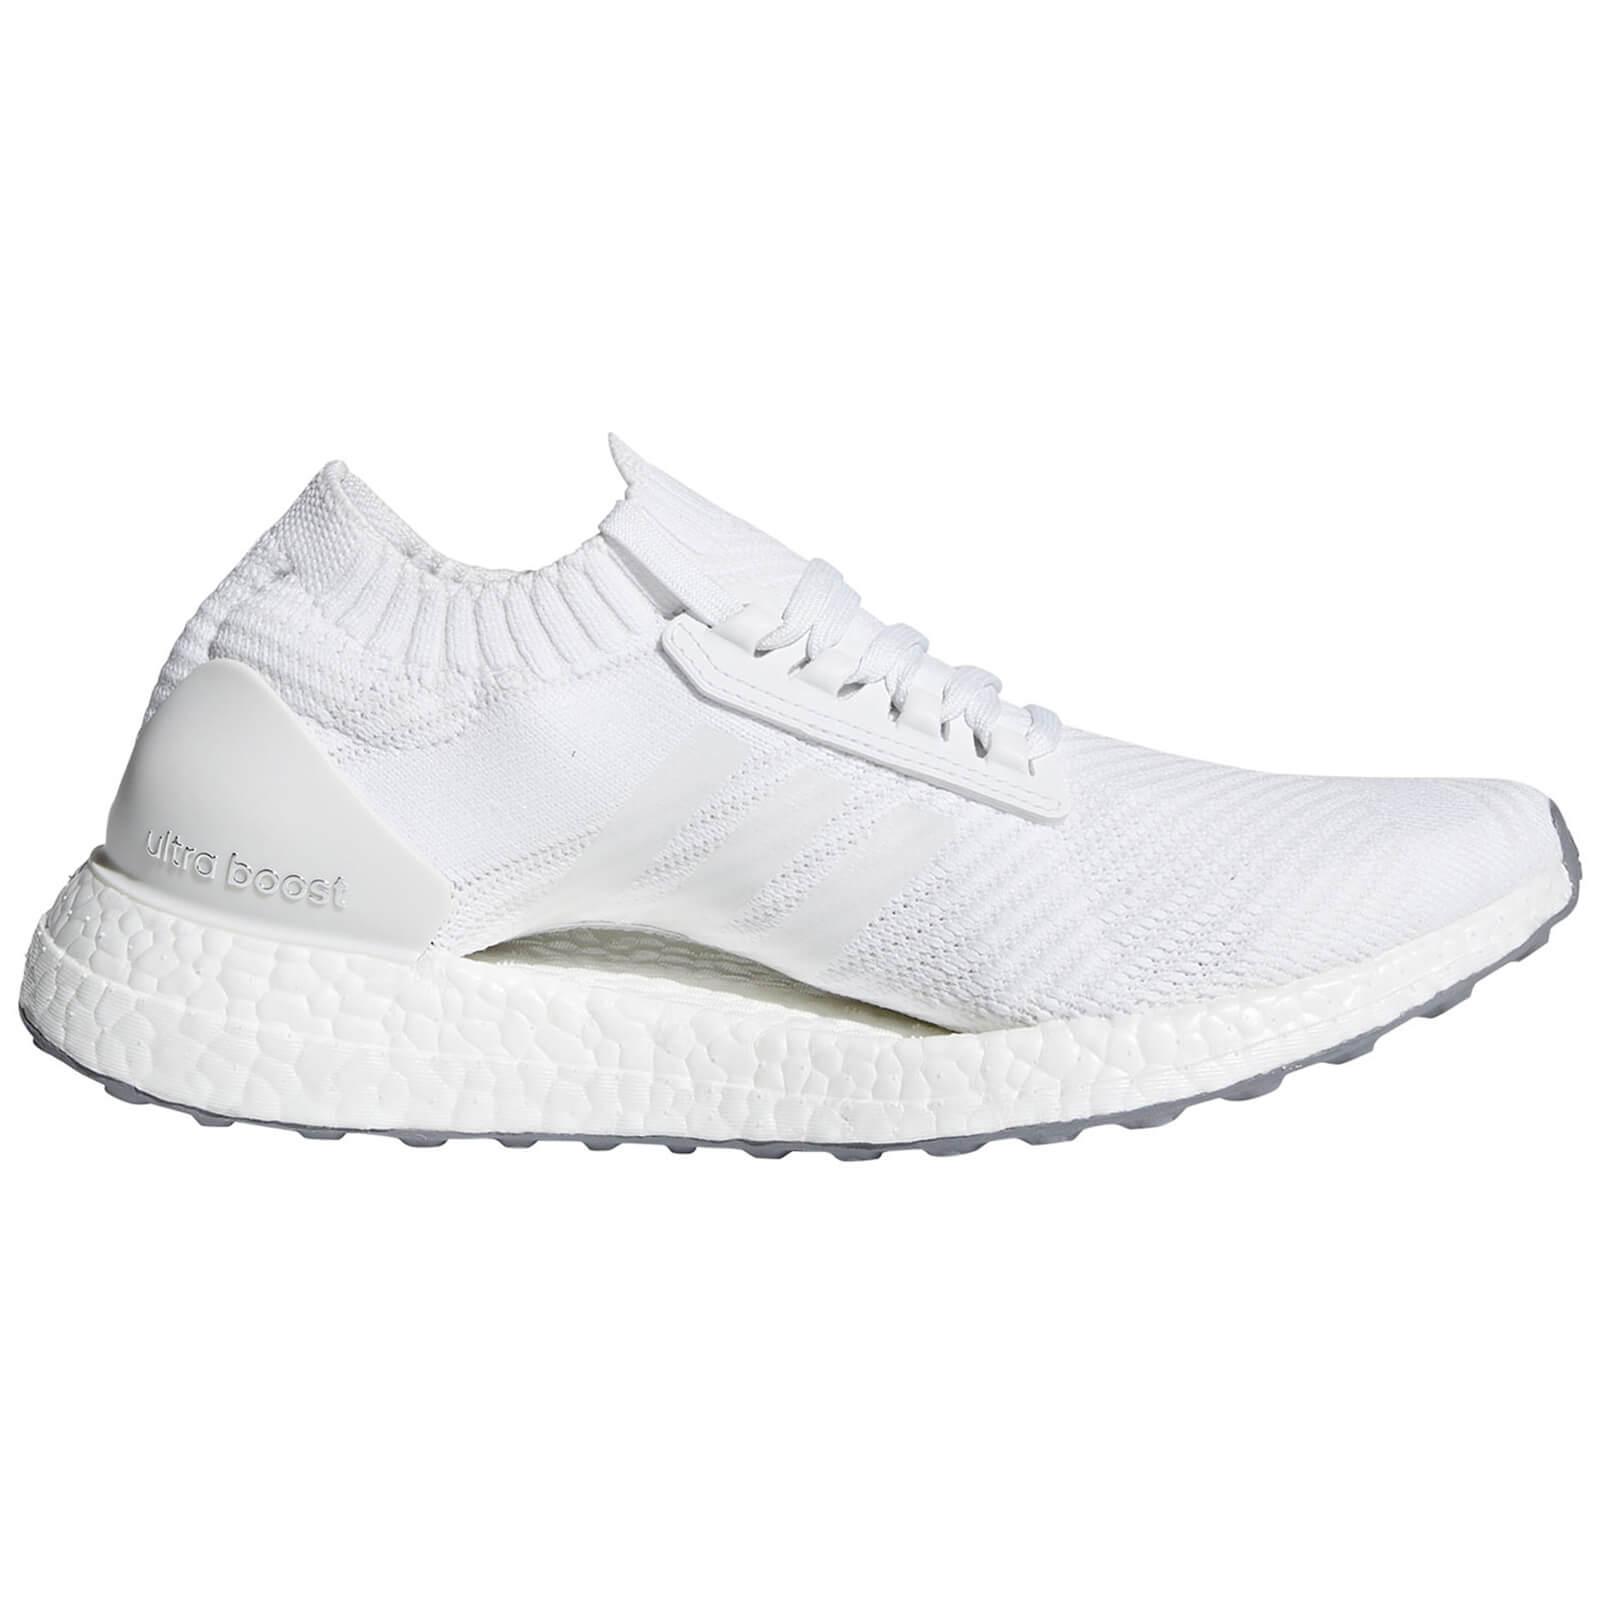 09ddfb7b038 adidas Women's Ultraboost X Running Shoes - White